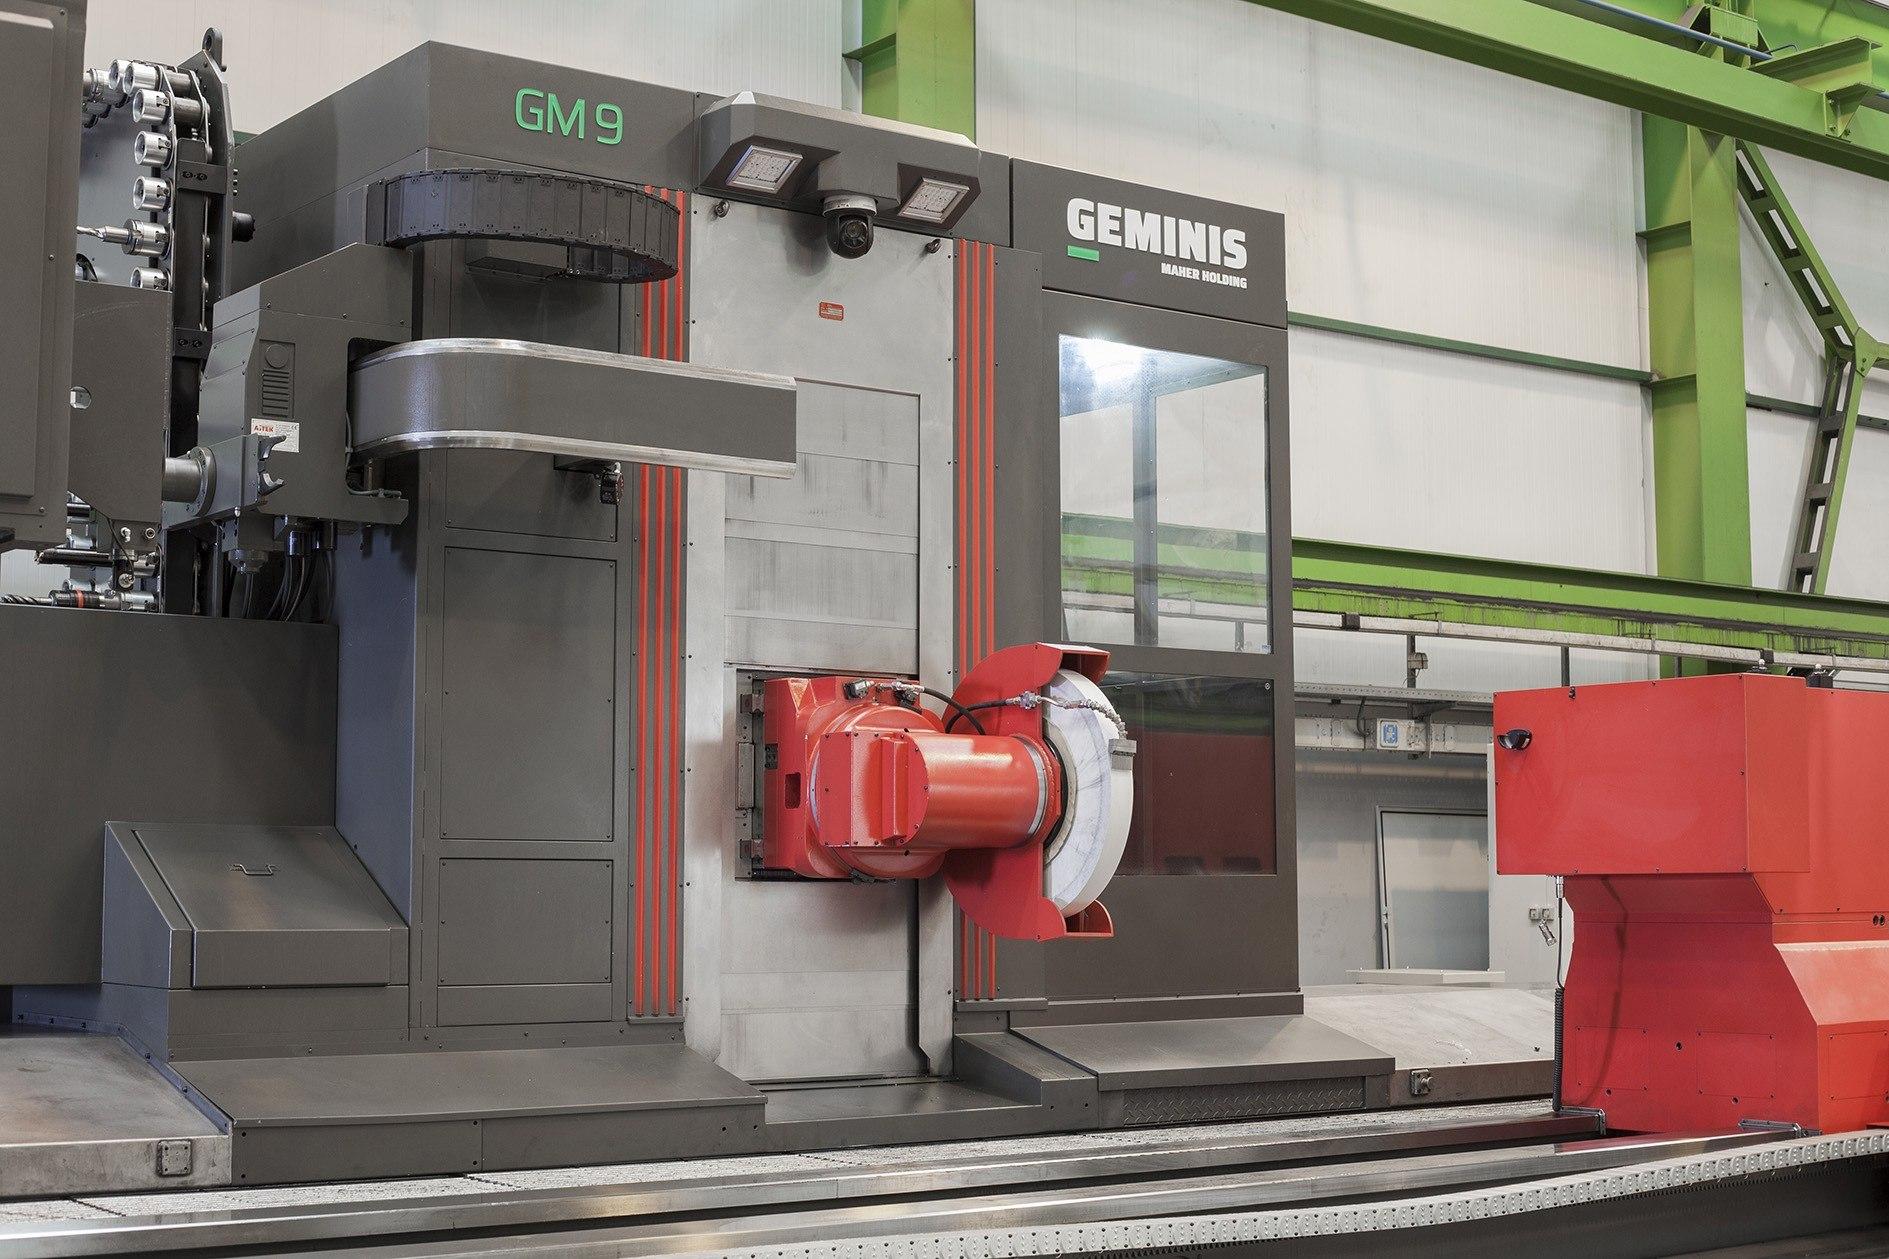 Multiprocess lathe gallery GM-9 - image 7 - Machine tool - Geminis Lathes